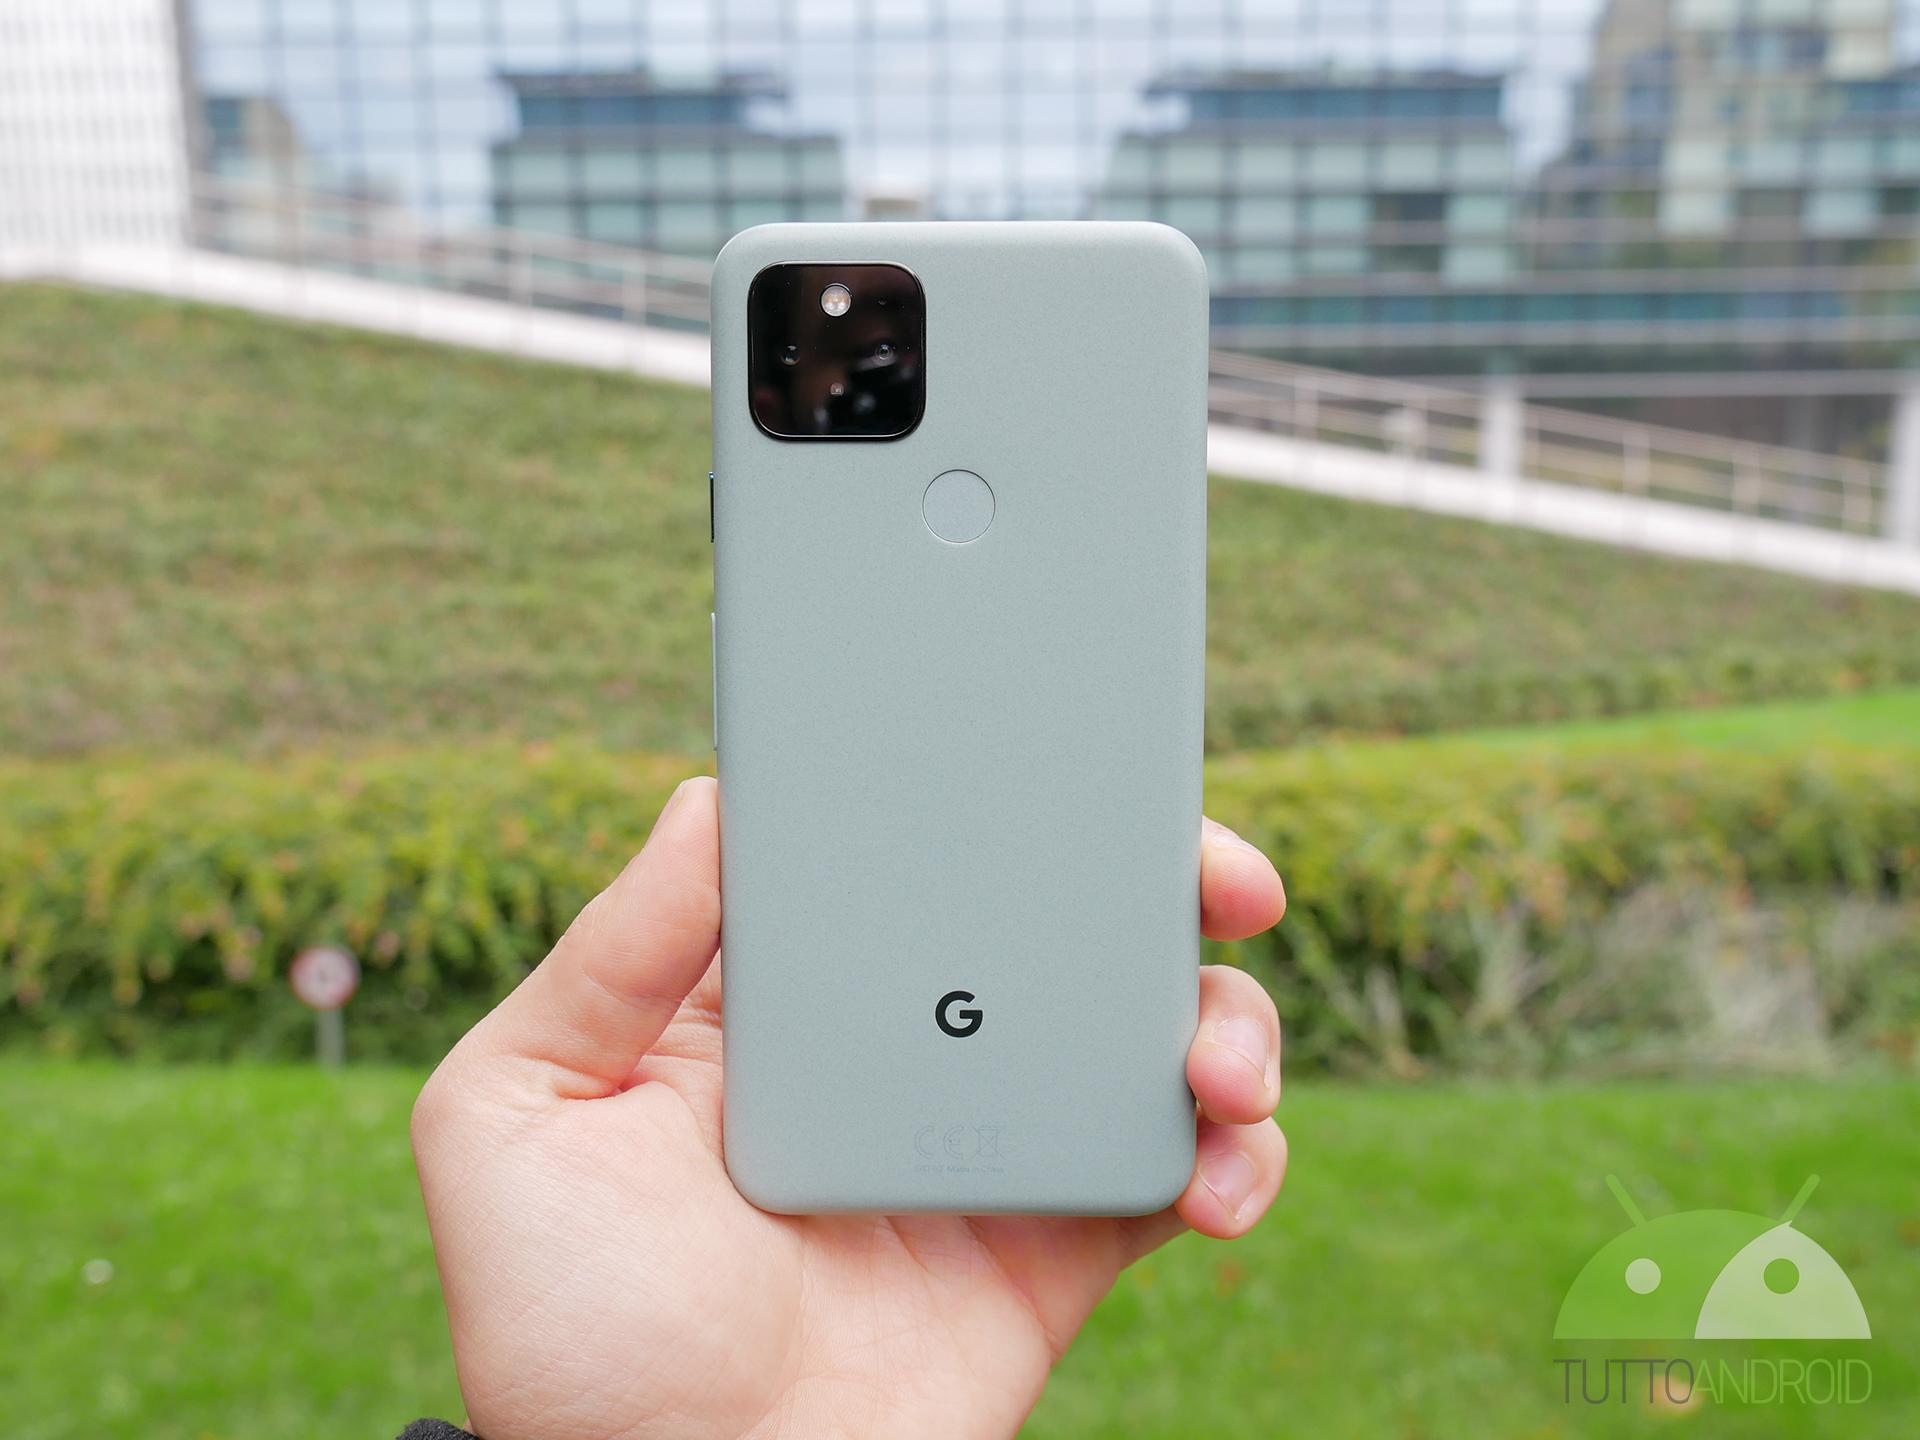 Google Pixel 4a 5G riceve più supporto di Google Pixel 5: ecco perché